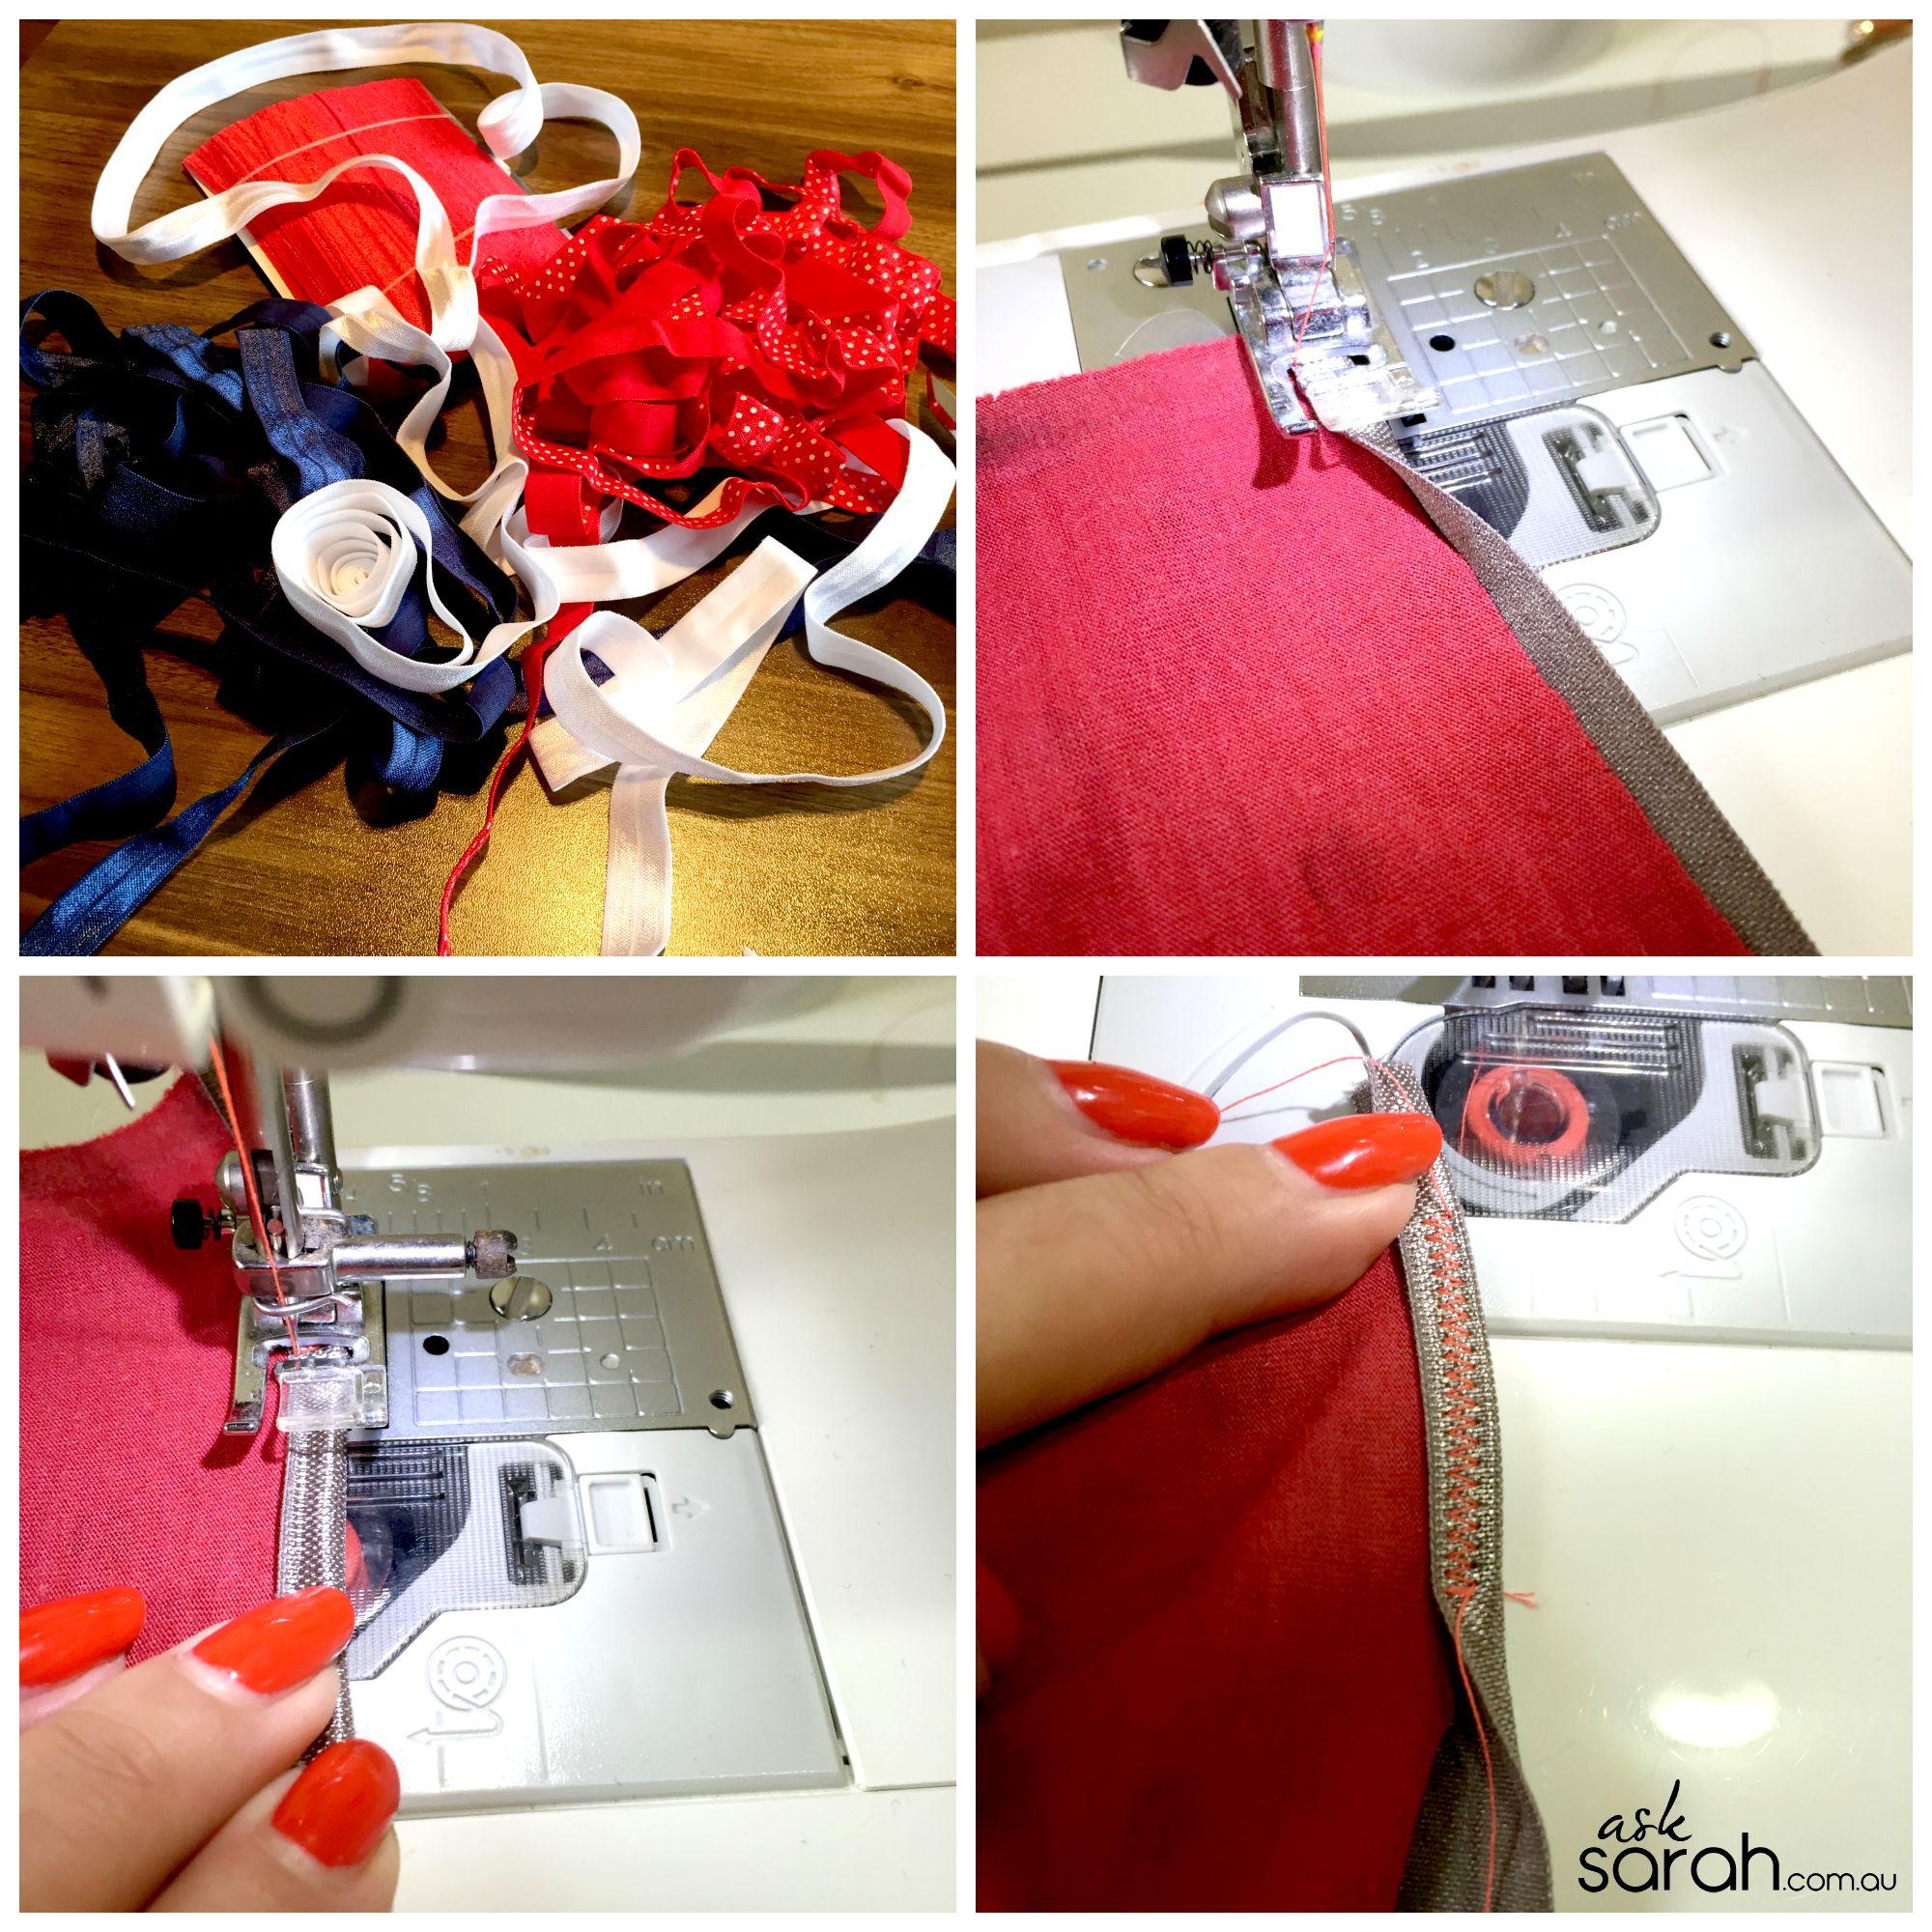 Sew: Refashion A Tee Into A Shrug/Bolero {A Perfect Way To Reuse A Too Tight Tee!}